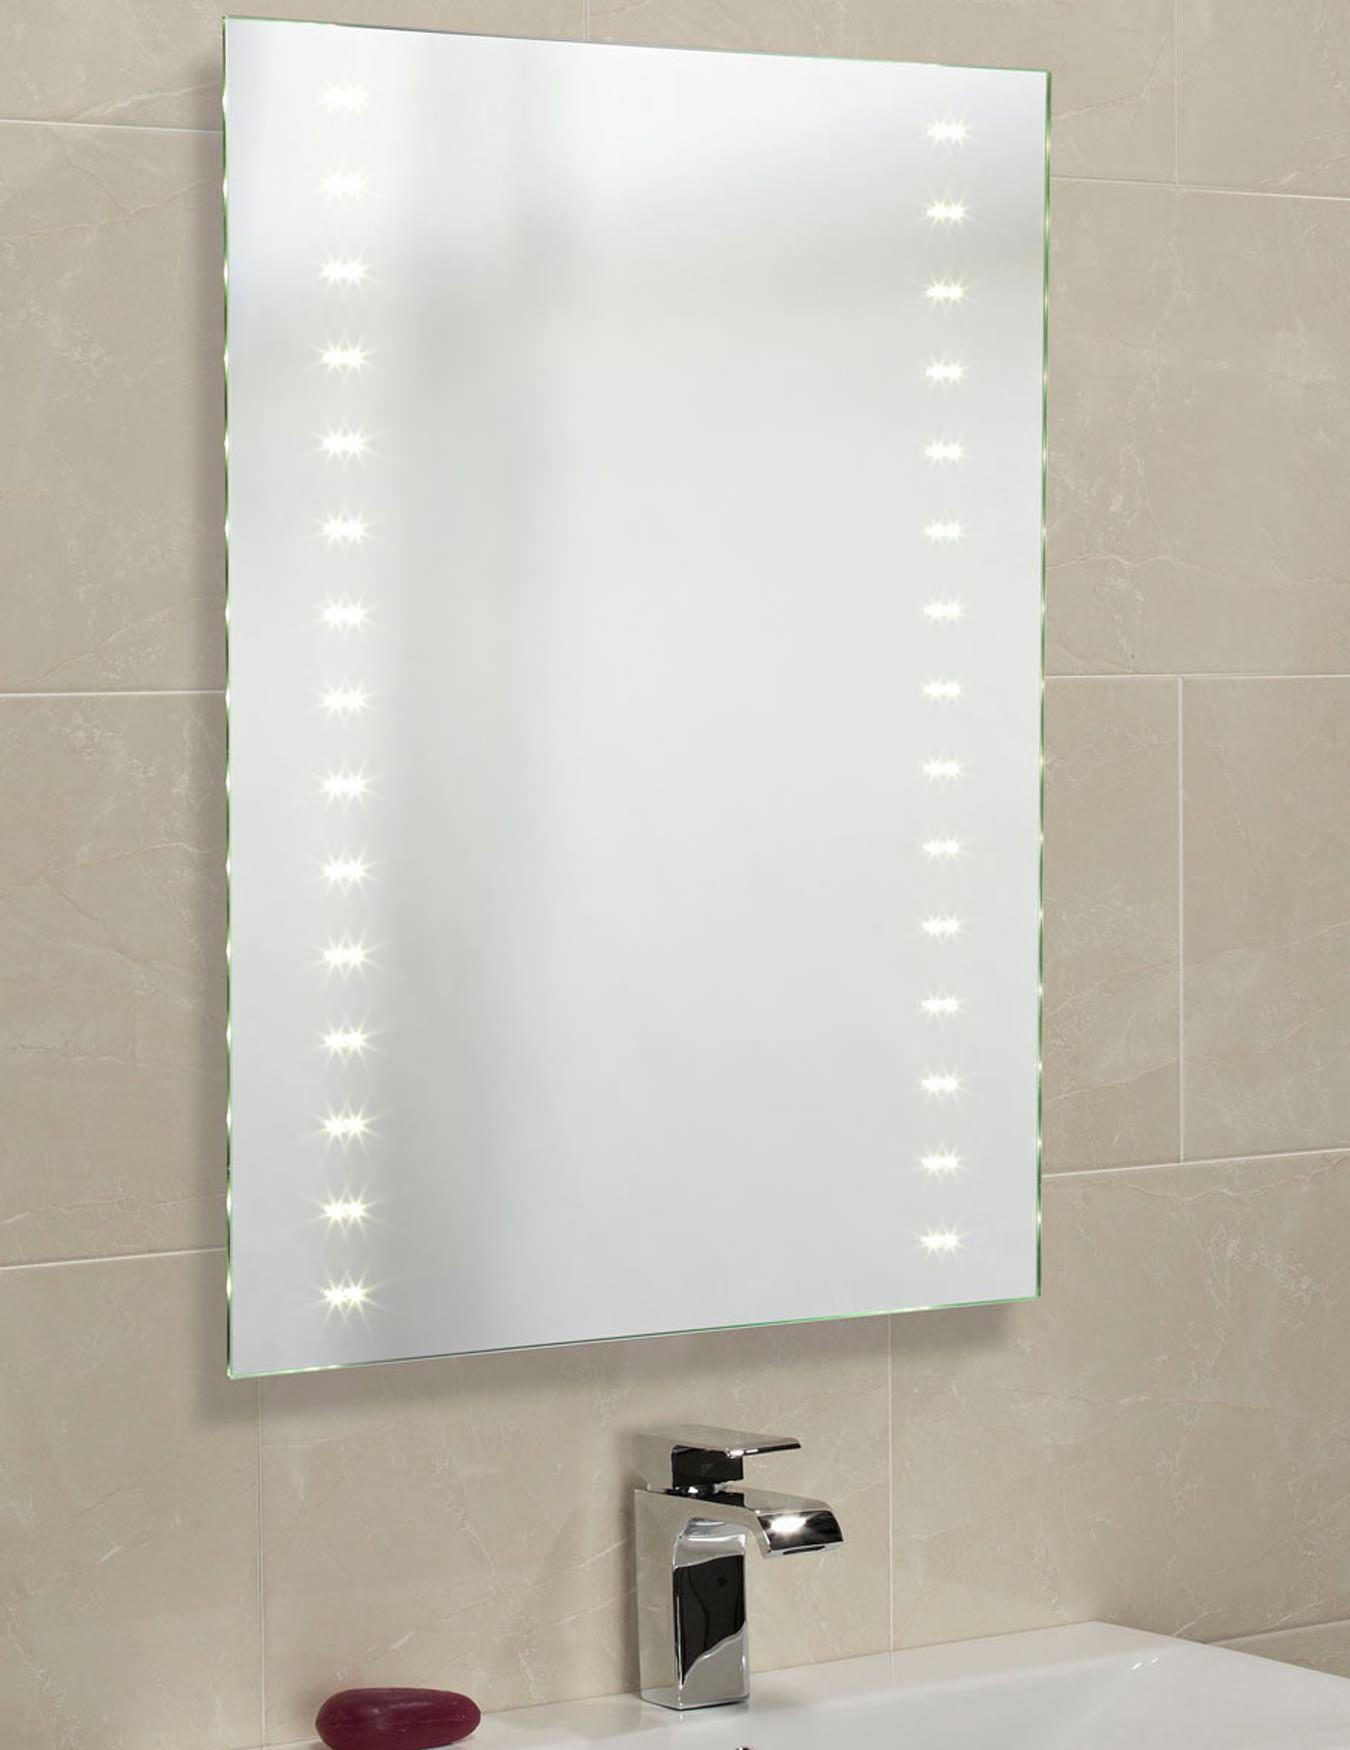 Roper Rhodes Clarity Pulse Plus LED Mirror